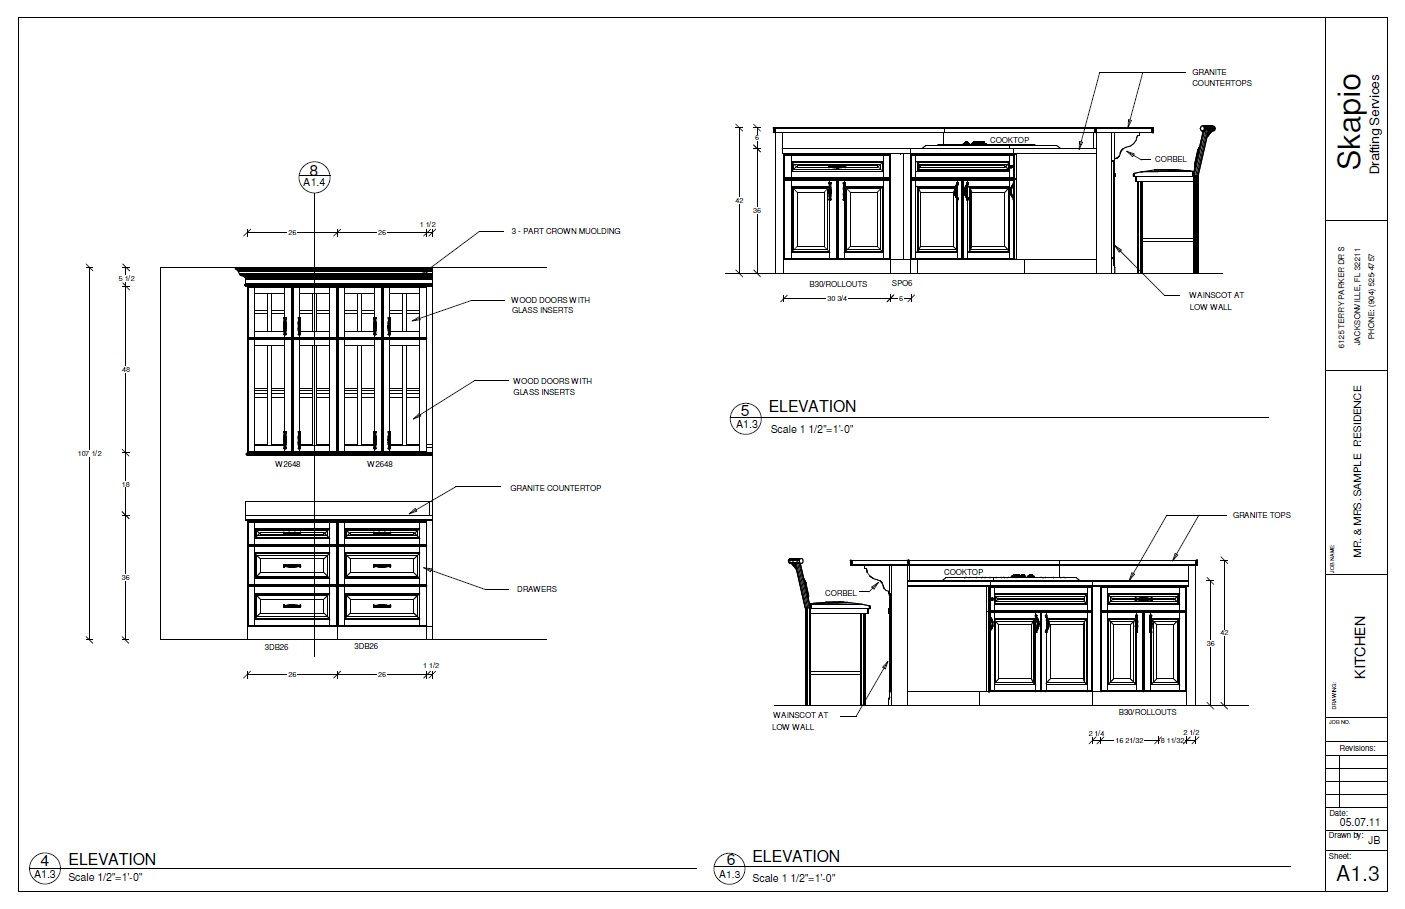 Cadkitchenplans com millwork shop drawings cabinet shop drawings - Sample Kitchen Elevations Floor Planssketches